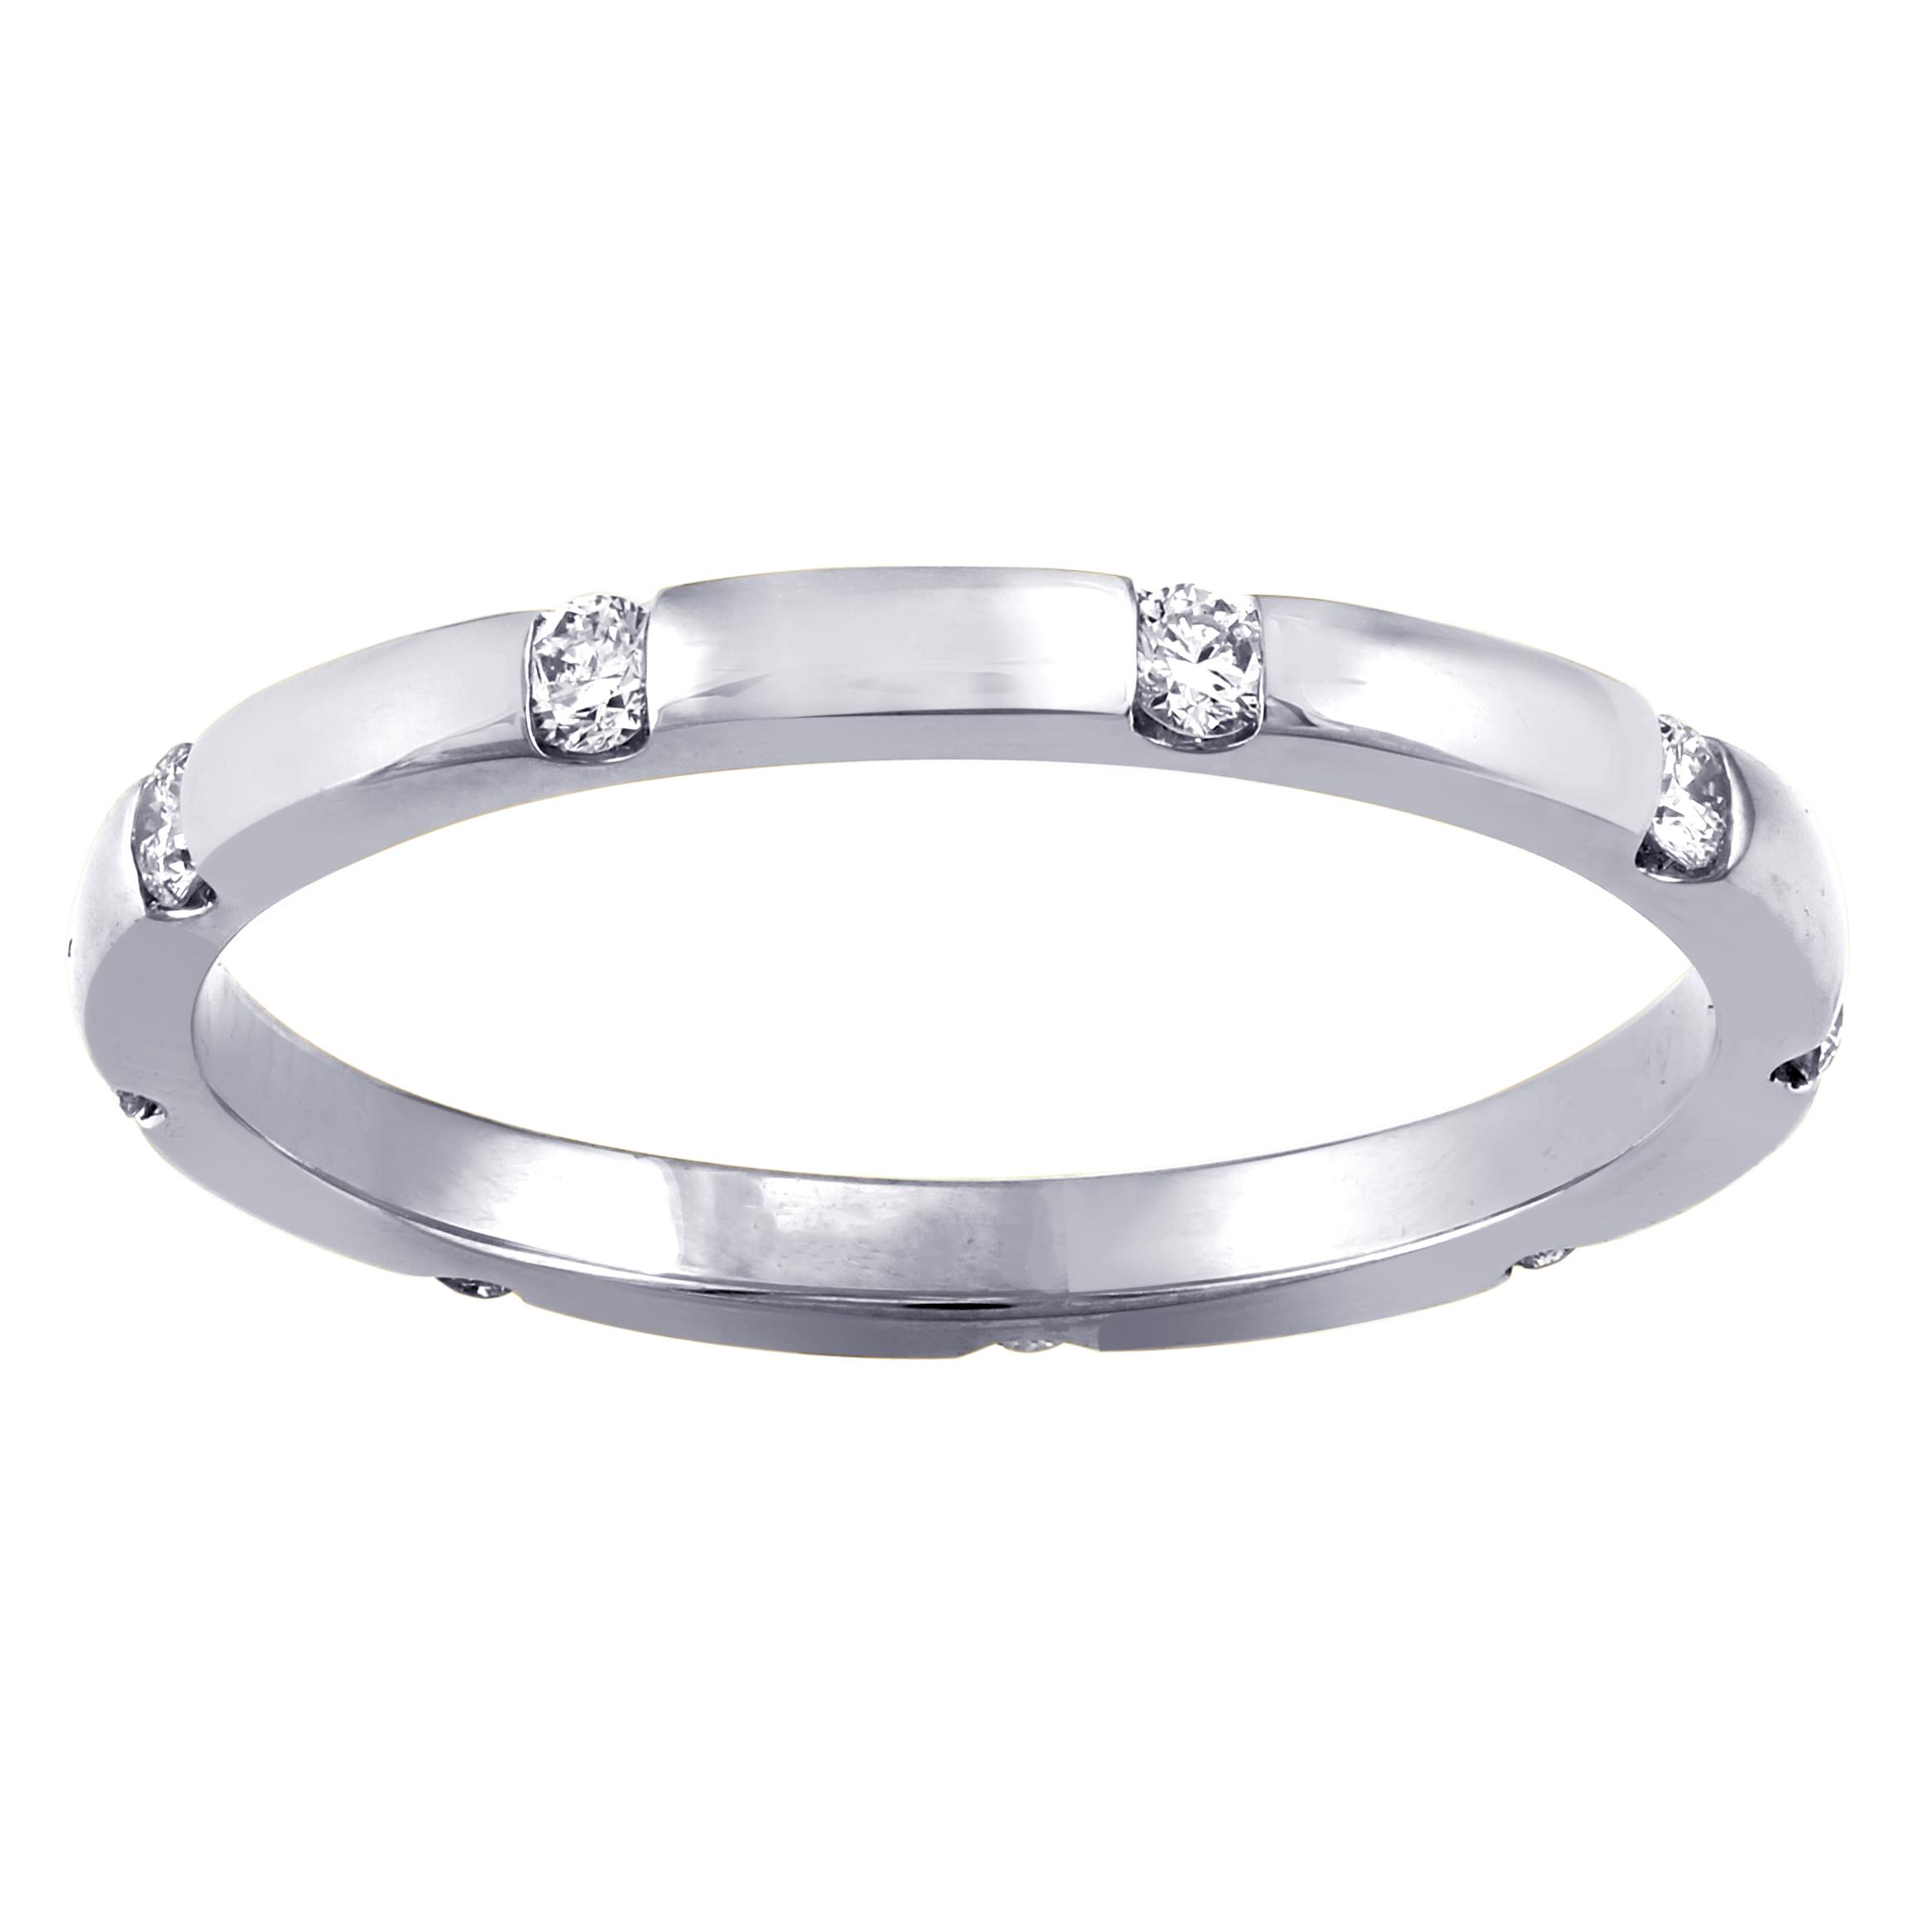 Hollywood Hills Jewelers 1/4 carat T.W. Diamond Eternity ...